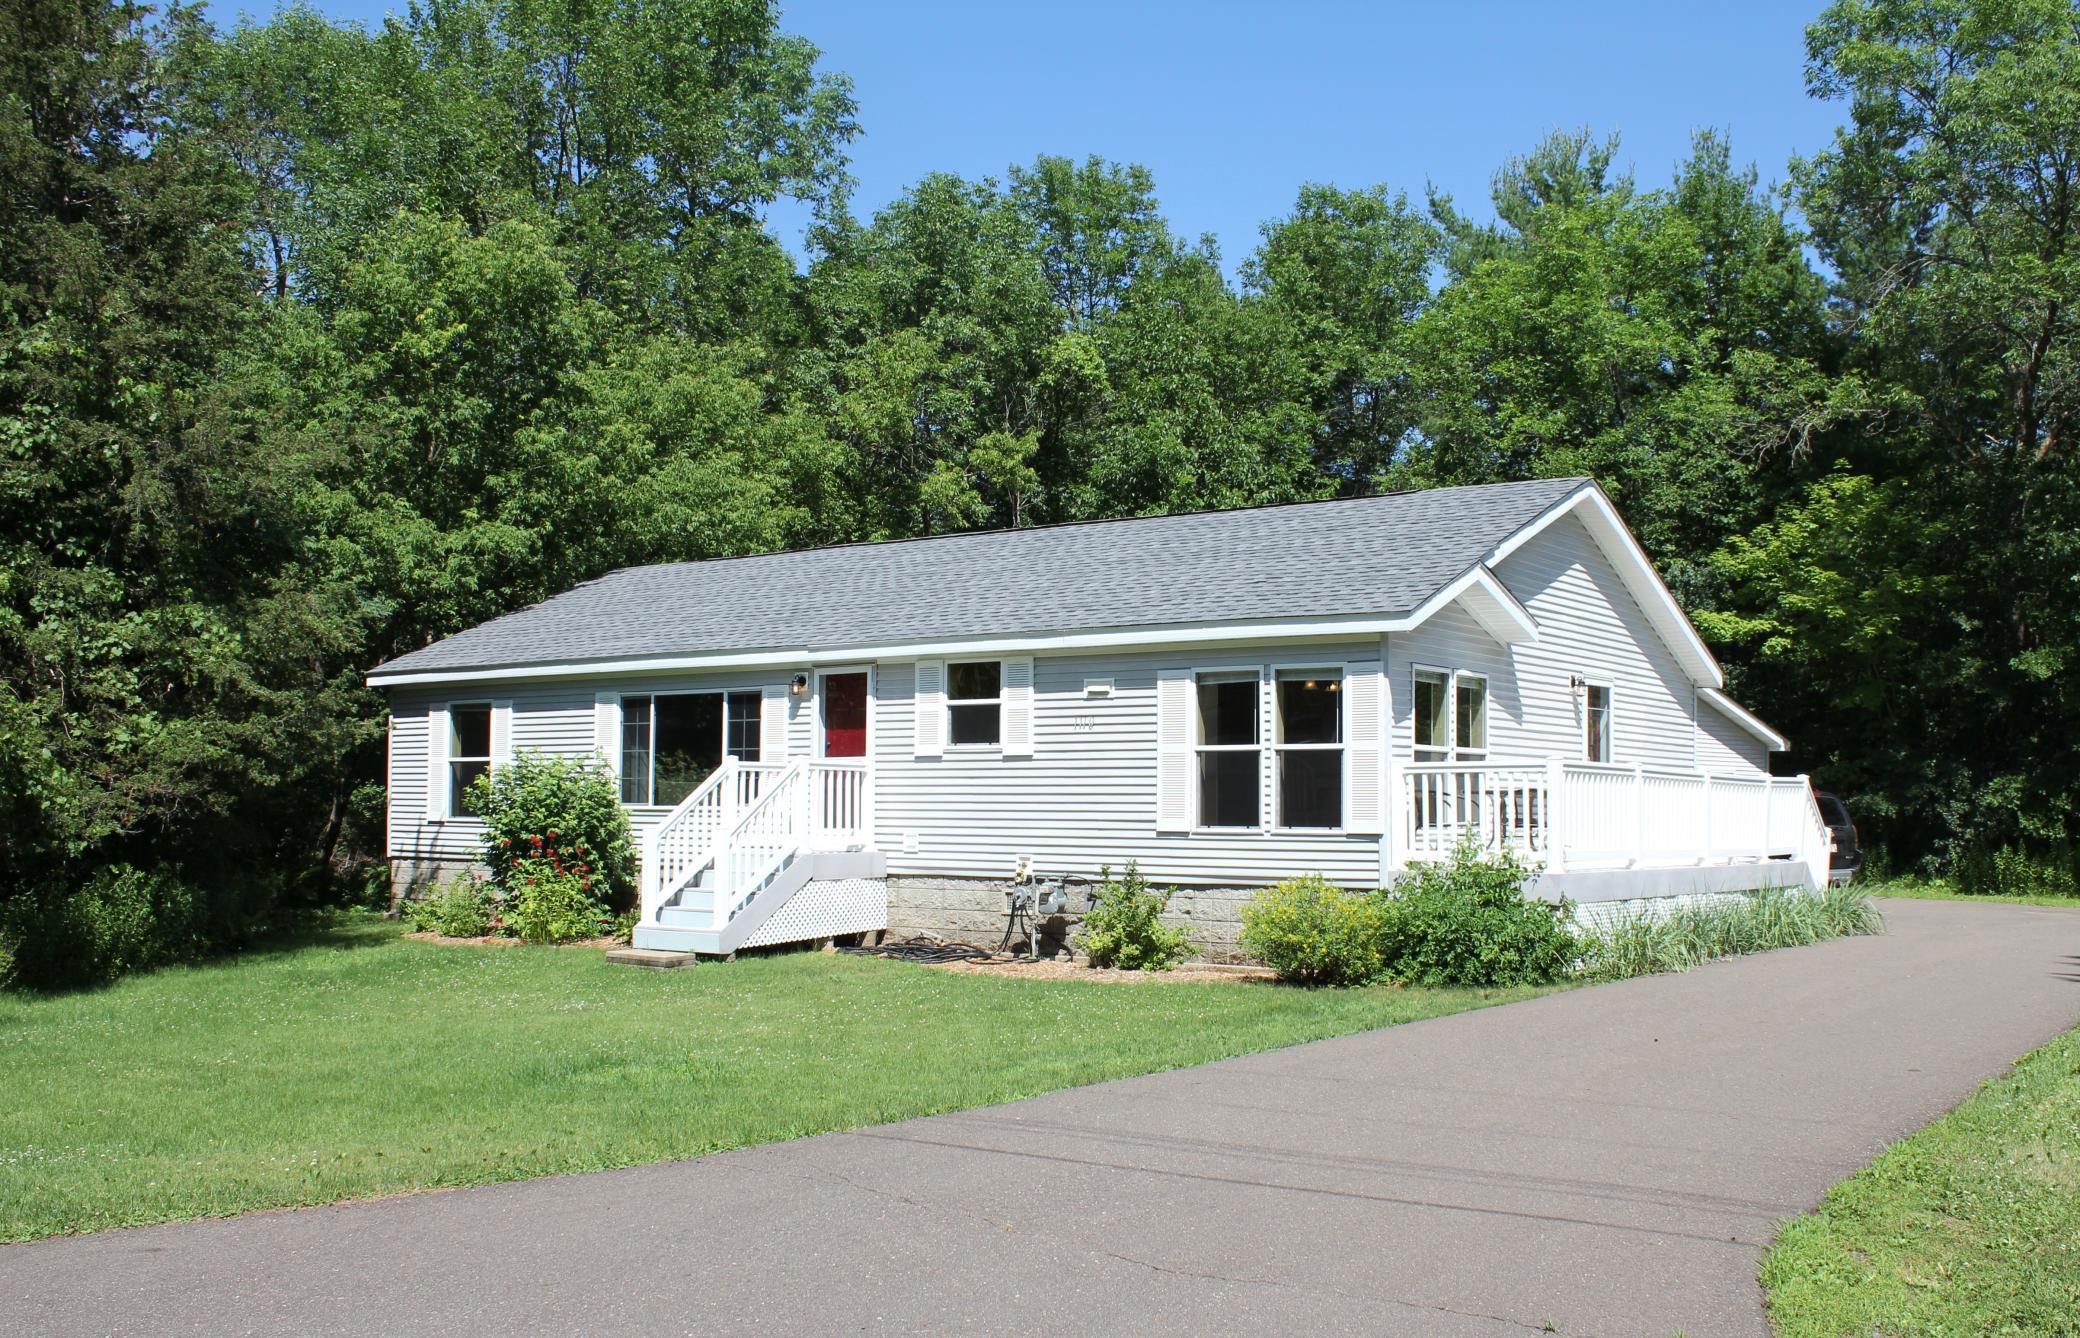 1110 Hamilton Property Photo - Saint Croix Falls, WI real estate listing